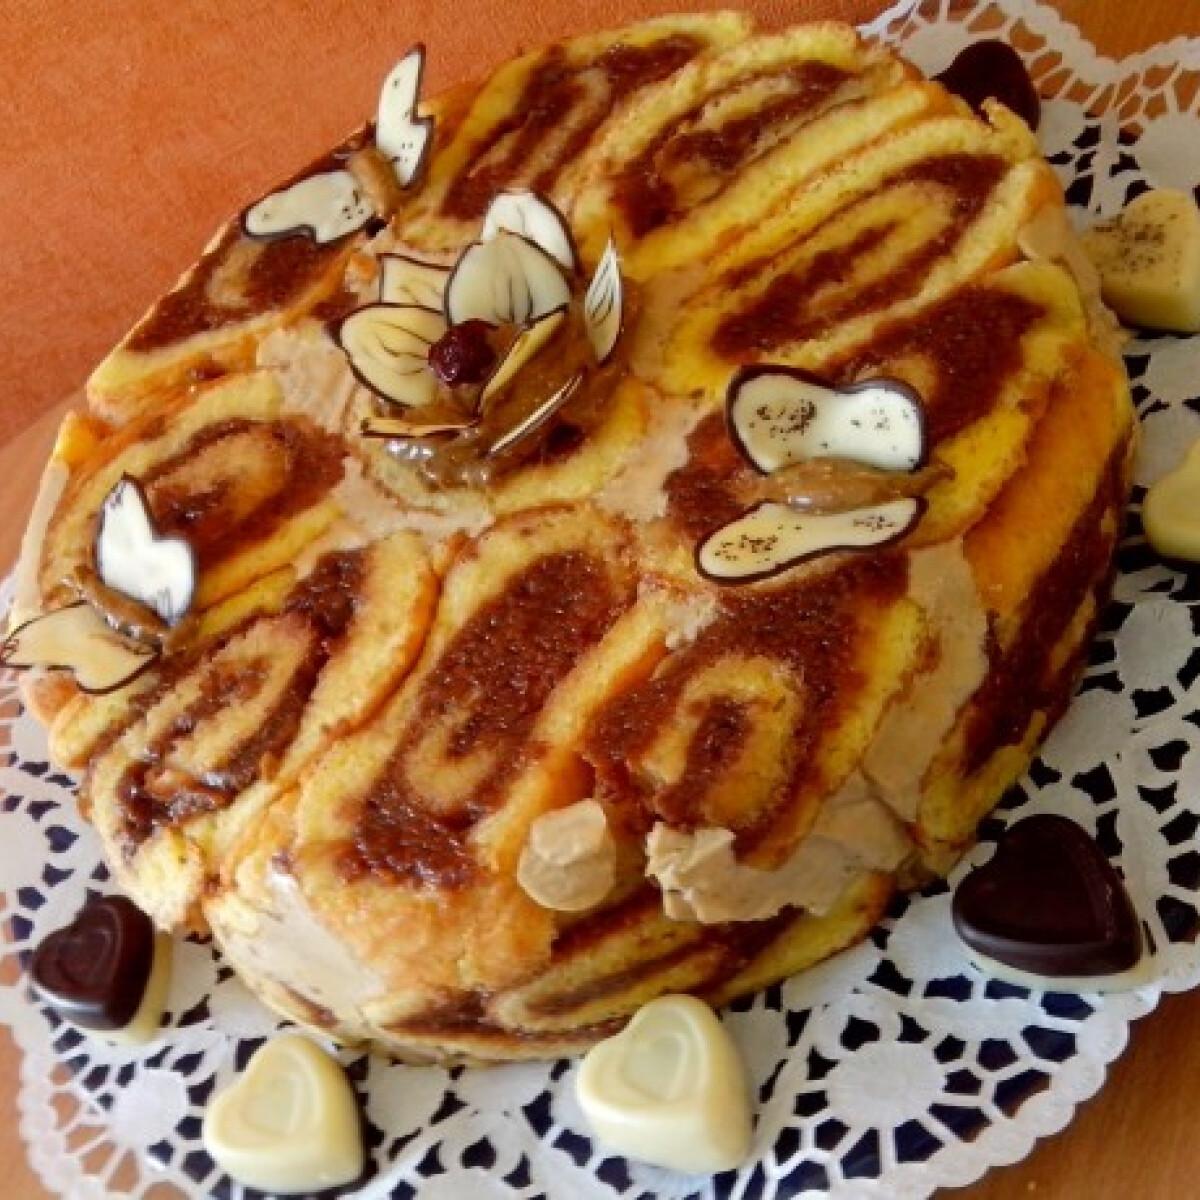 Ezen a képen: Hamis tiramisu krémes charlotte torta